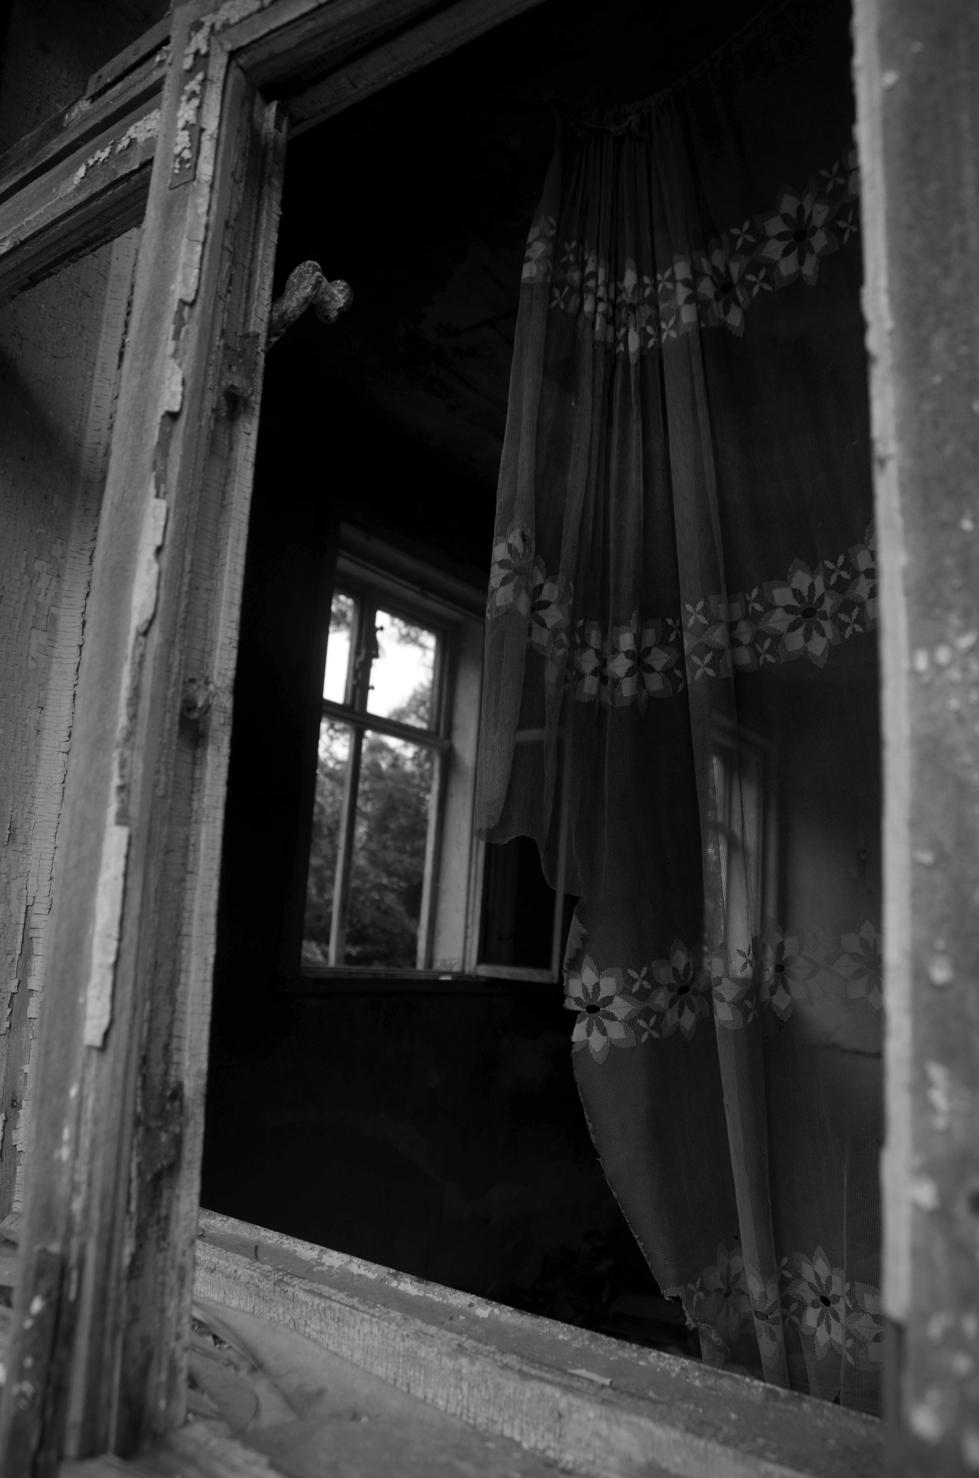 Czeski zakątek - Pstrążna - rozpad z firanką